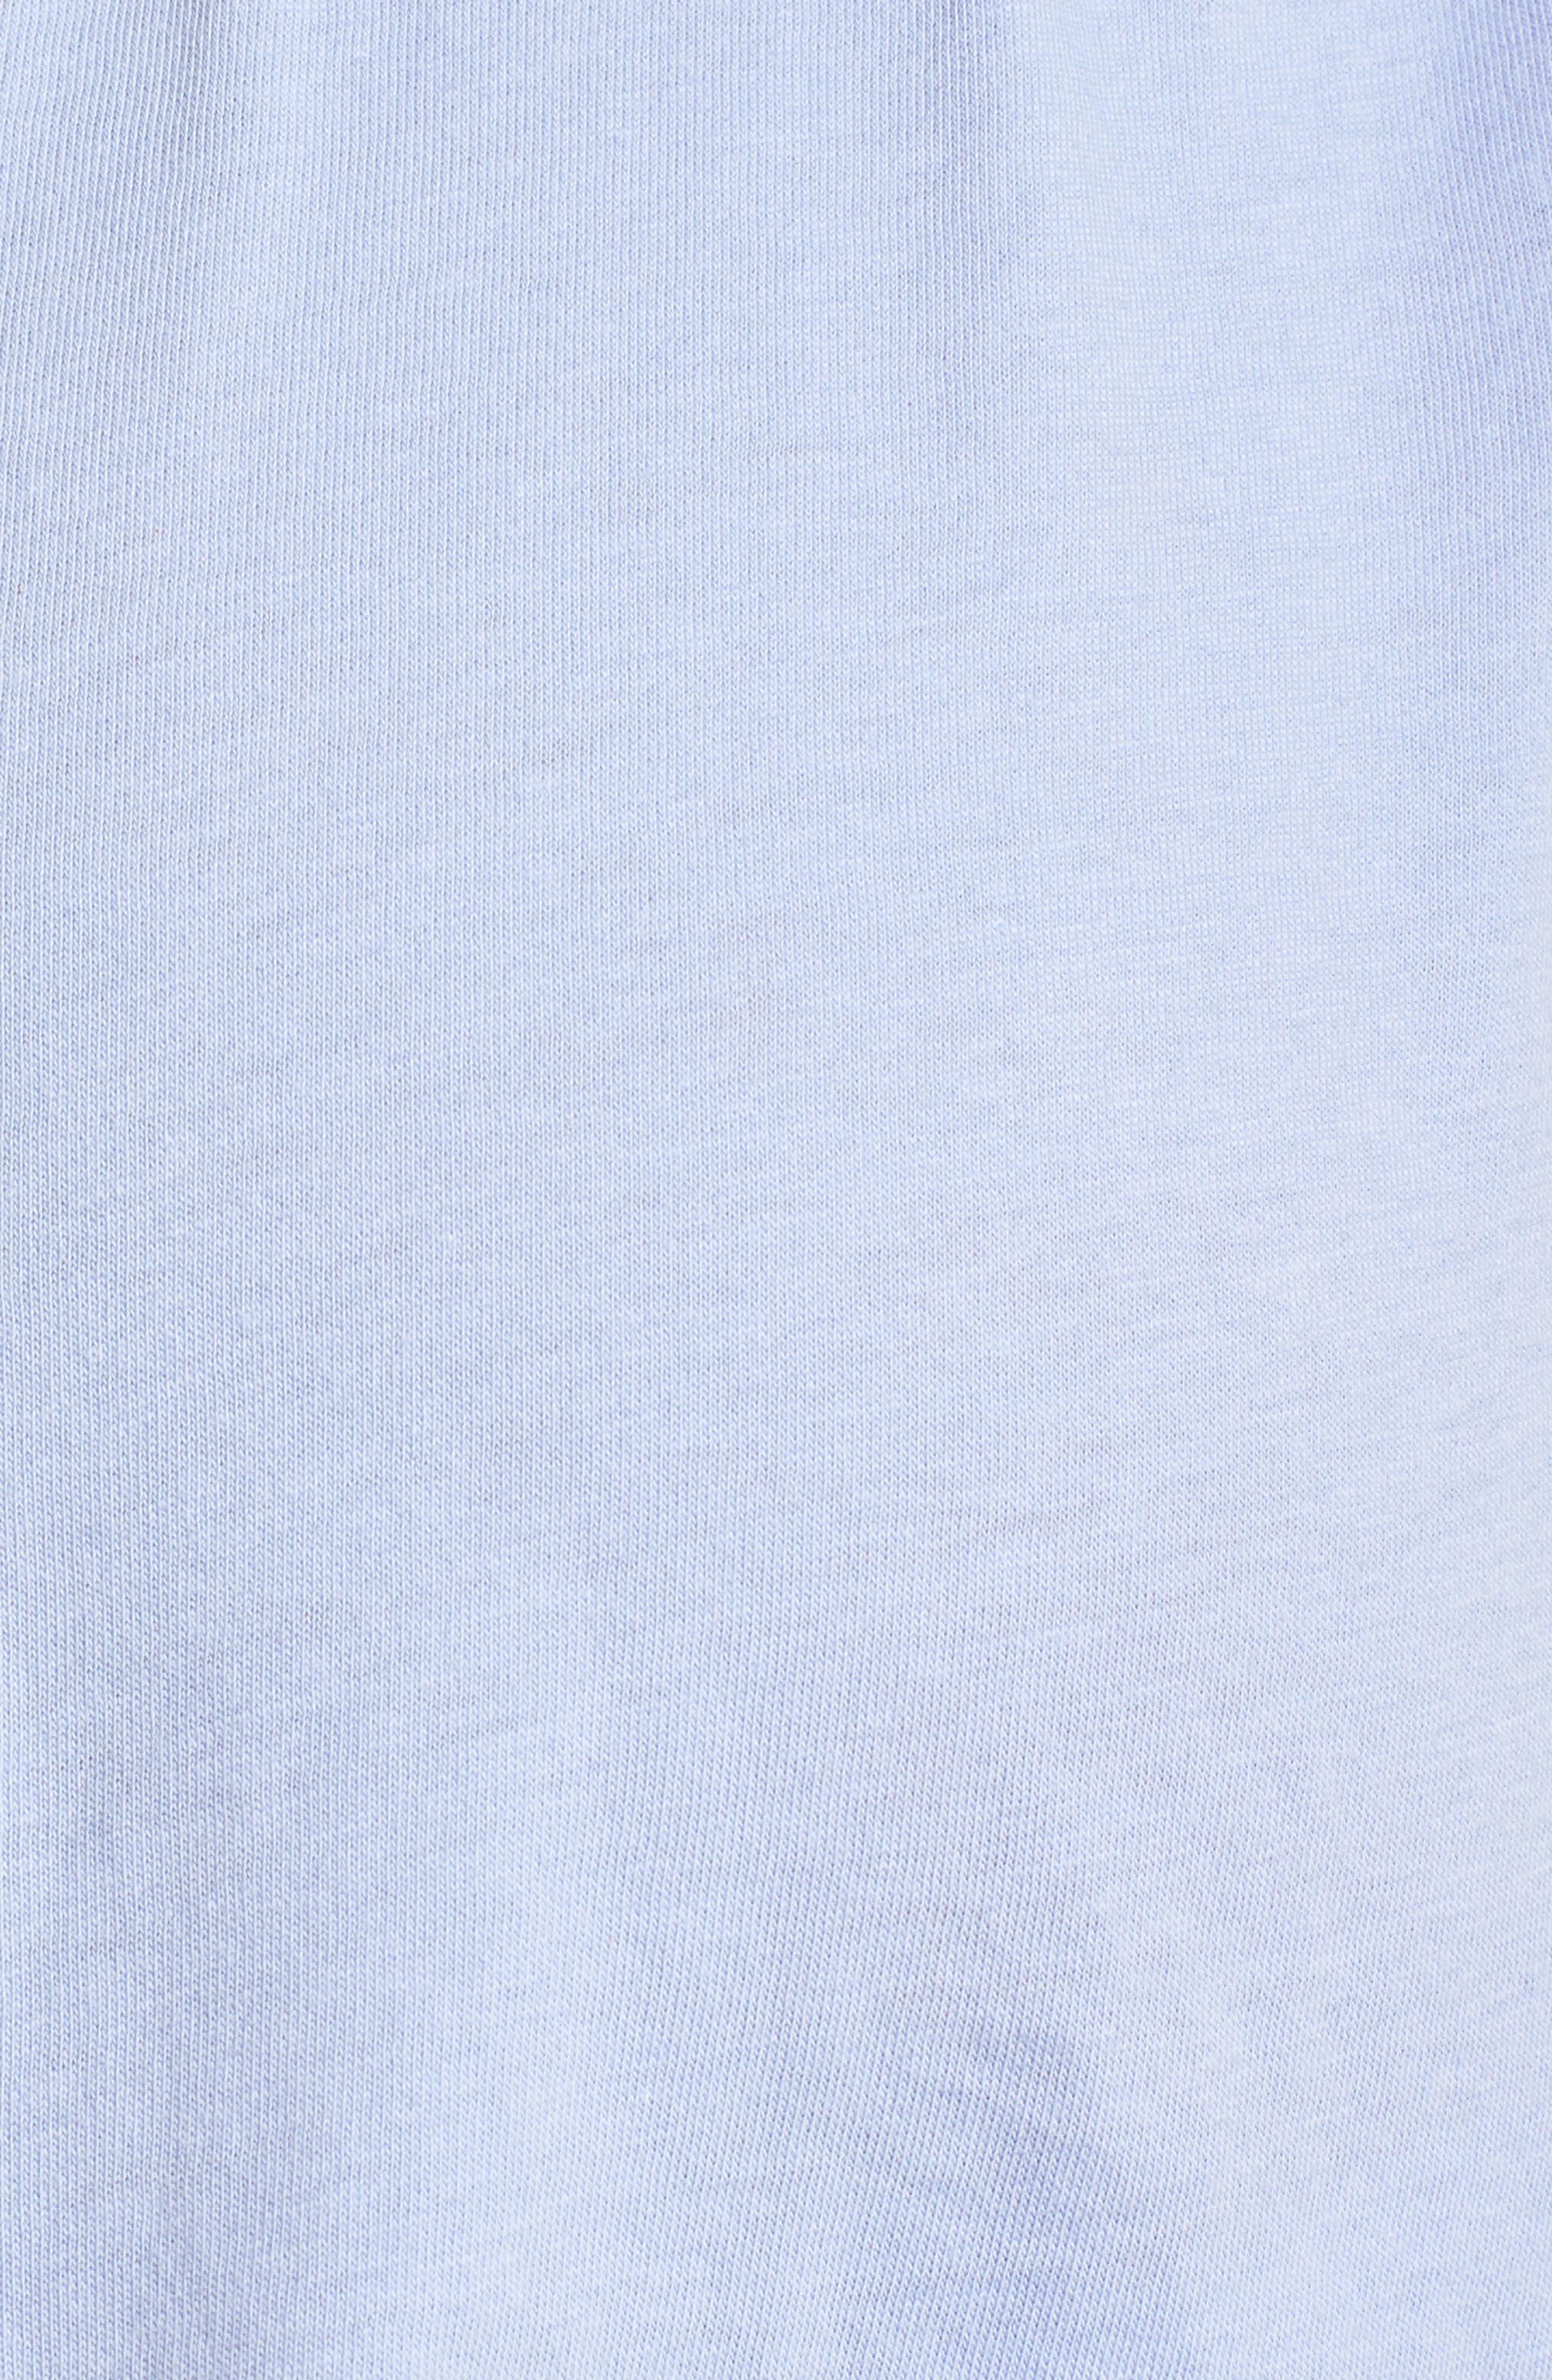 Violette Maternity/Nursing Pajamas,                             Alternate thumbnail 5, color,                             Indian Print